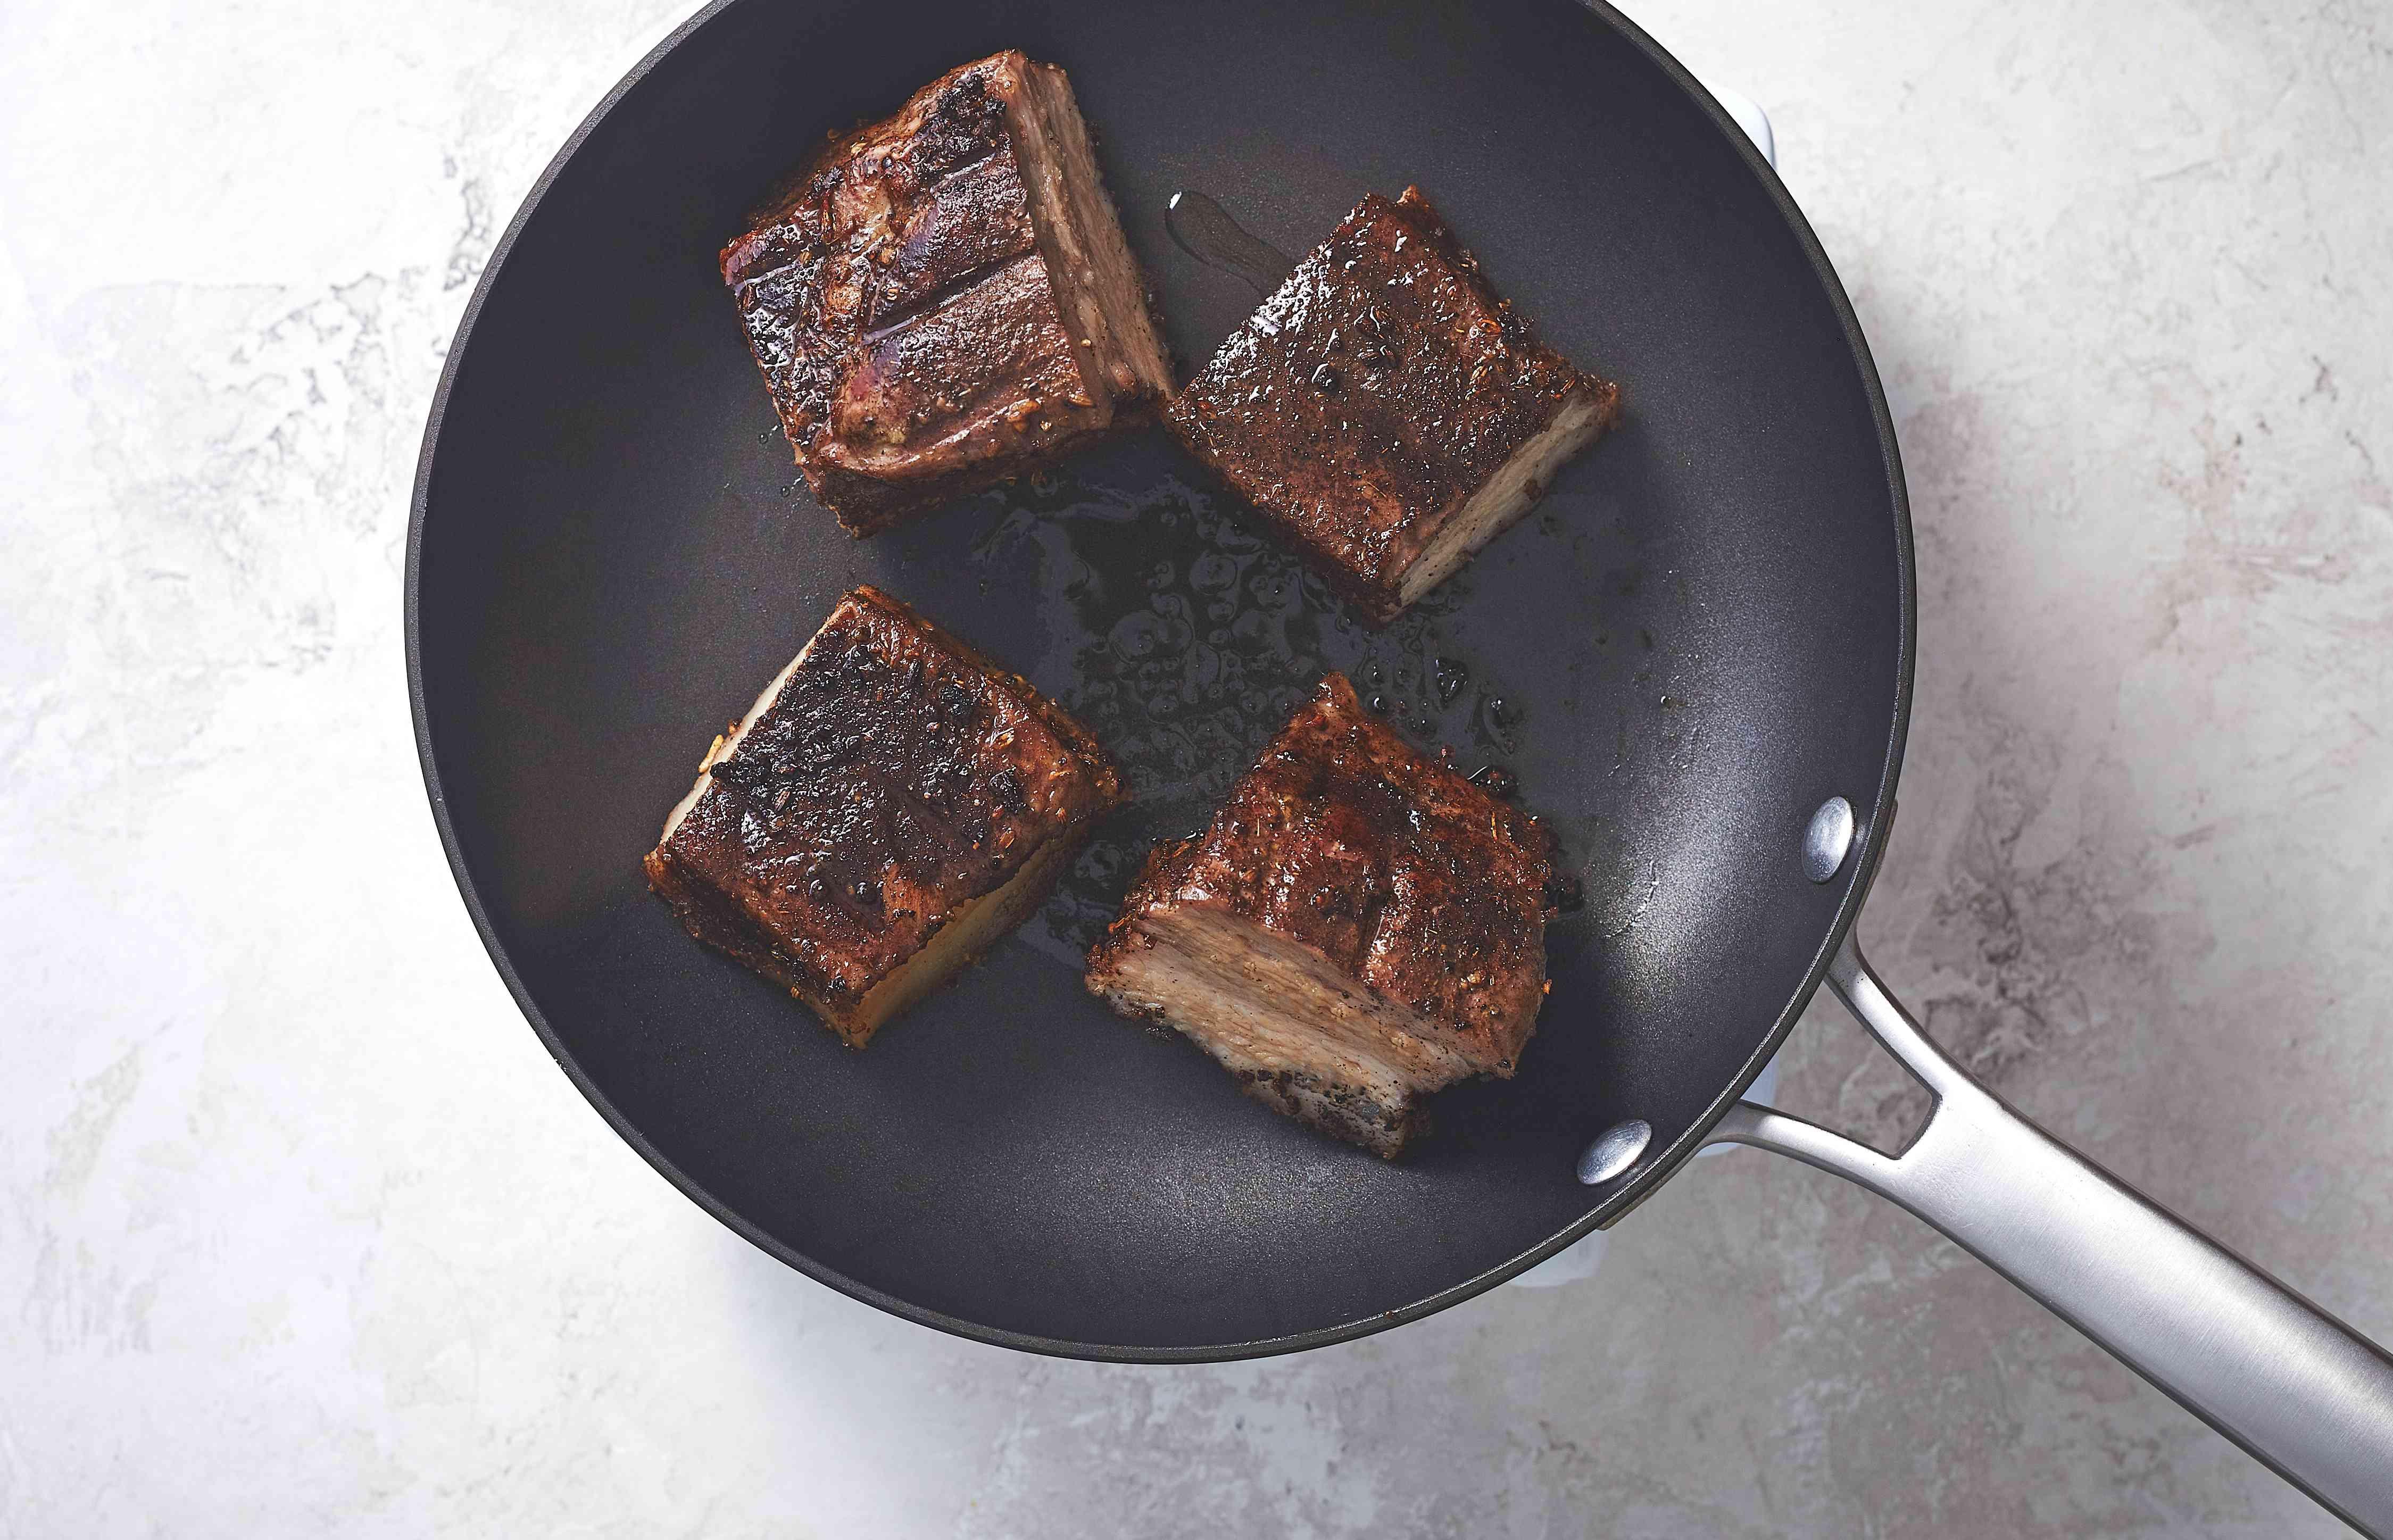 Braised Pork Belly in a pan